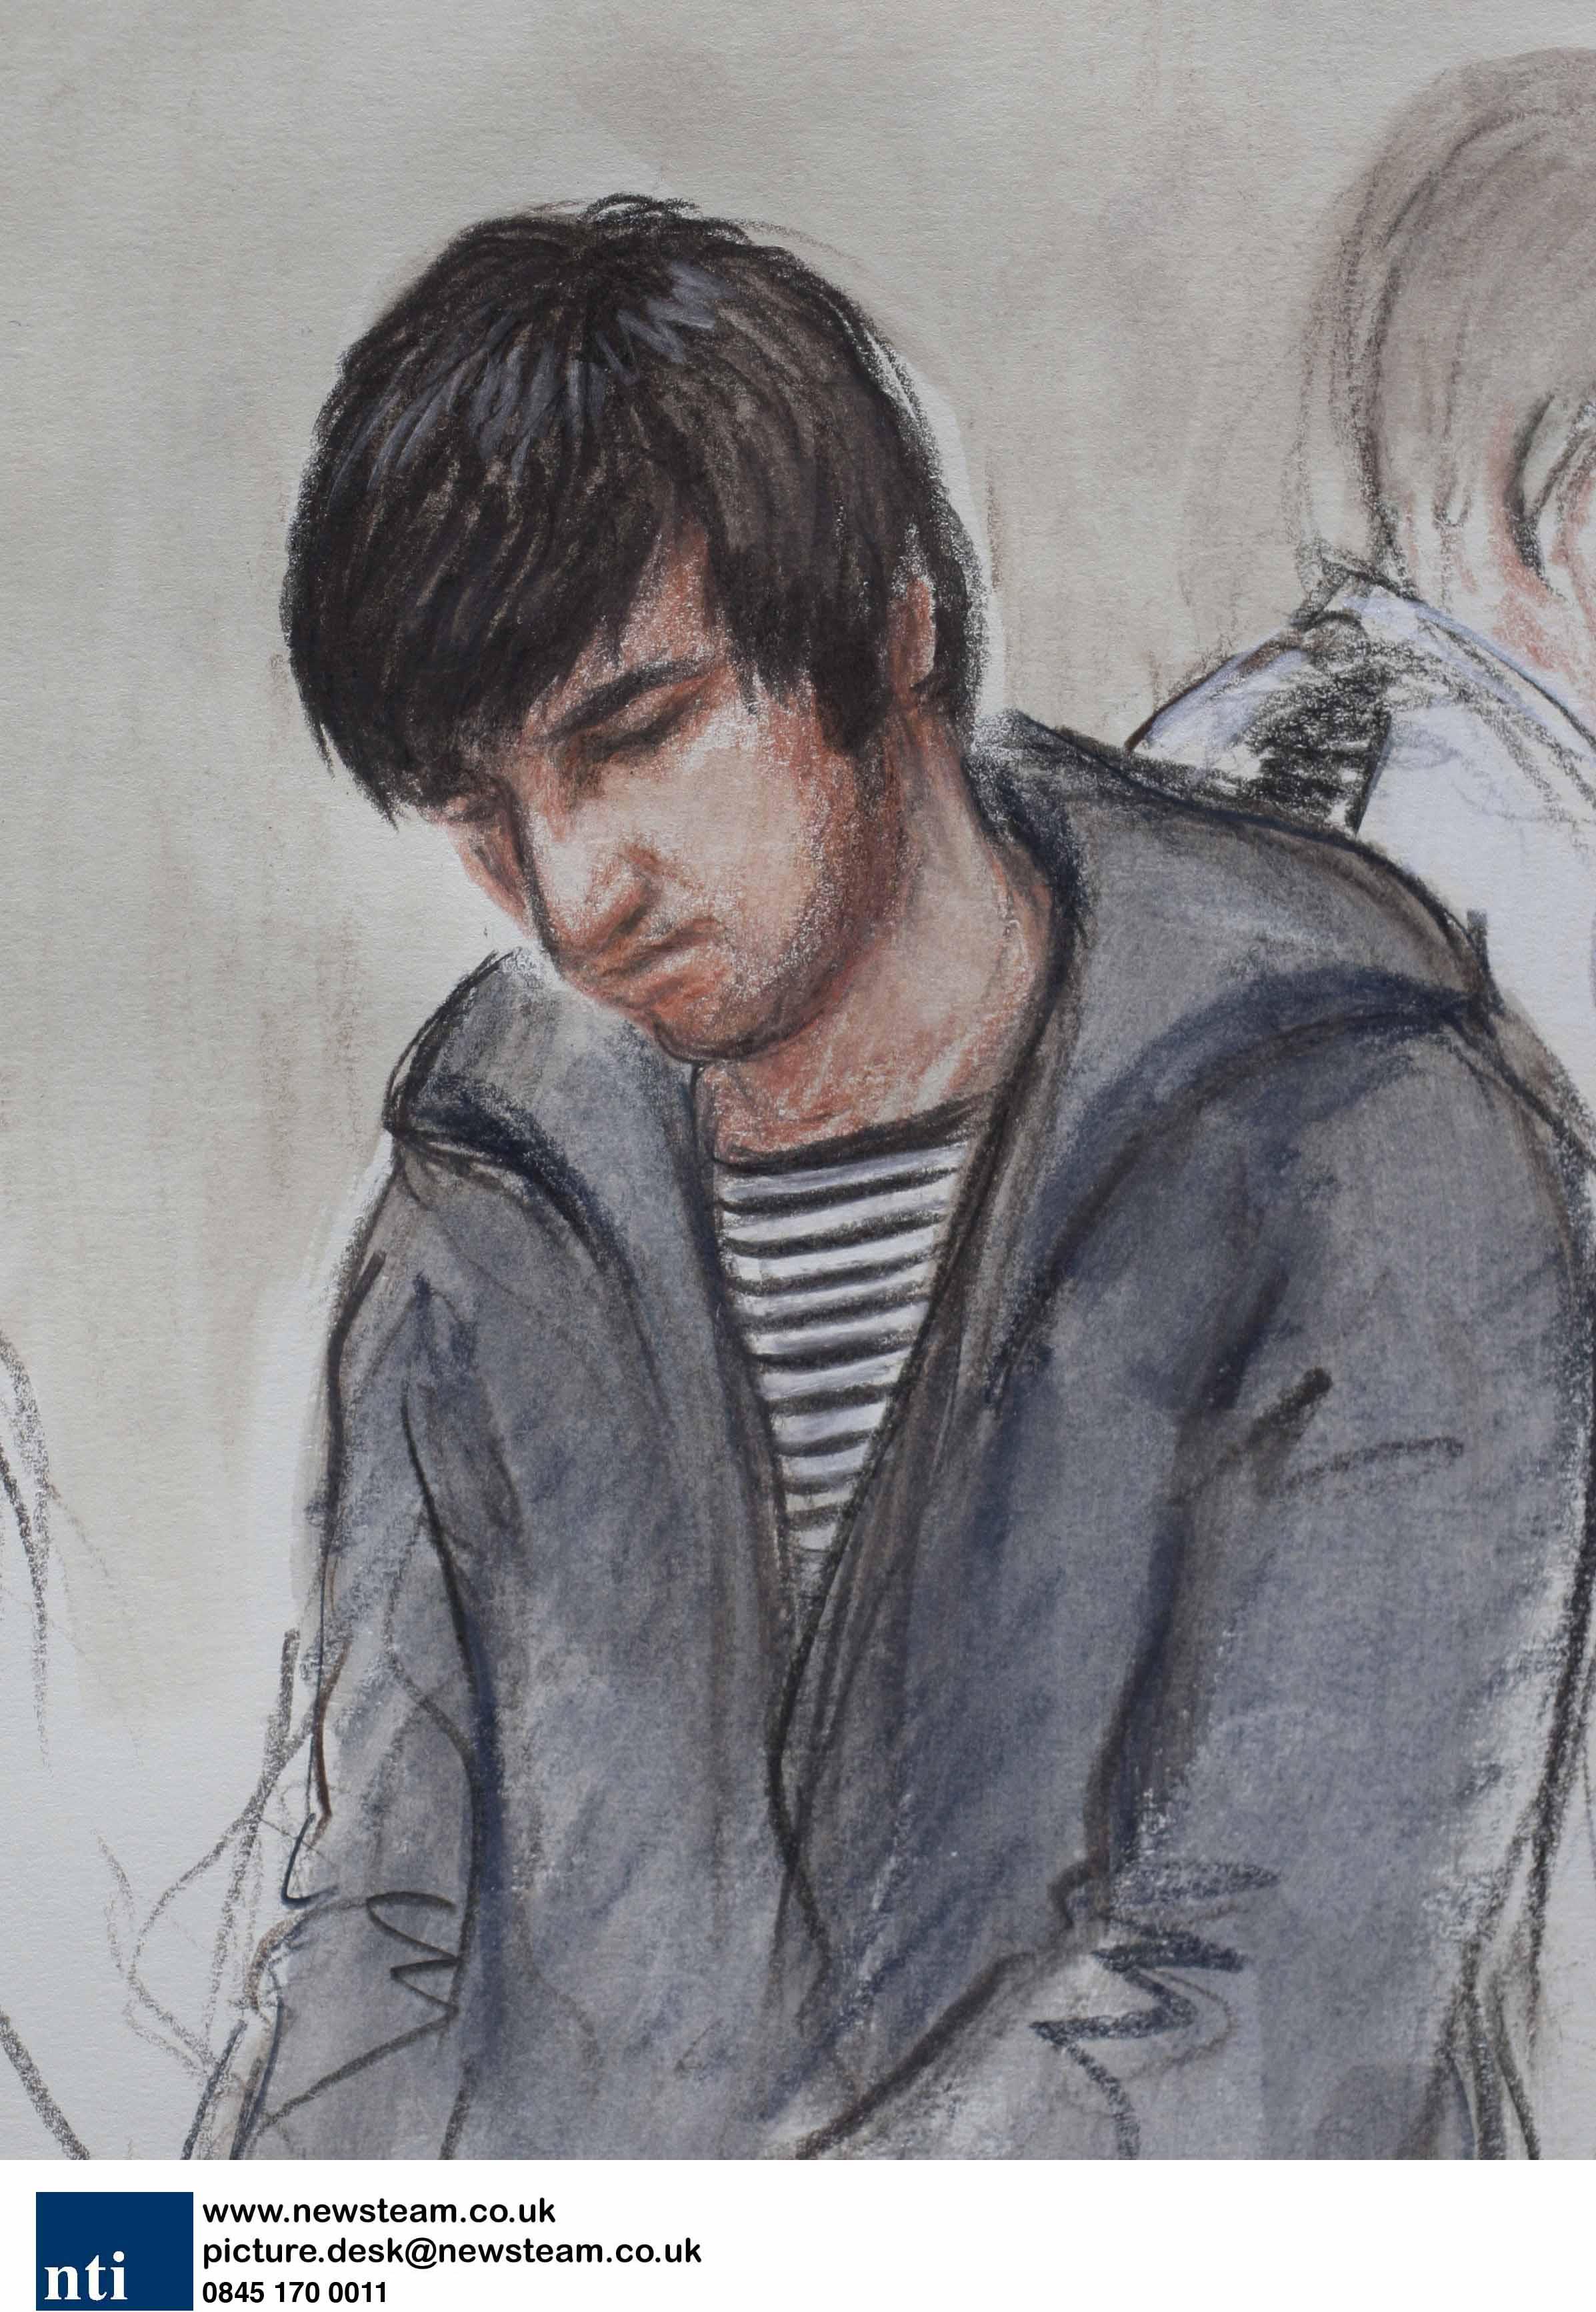 Paedophile nursery worker gets life